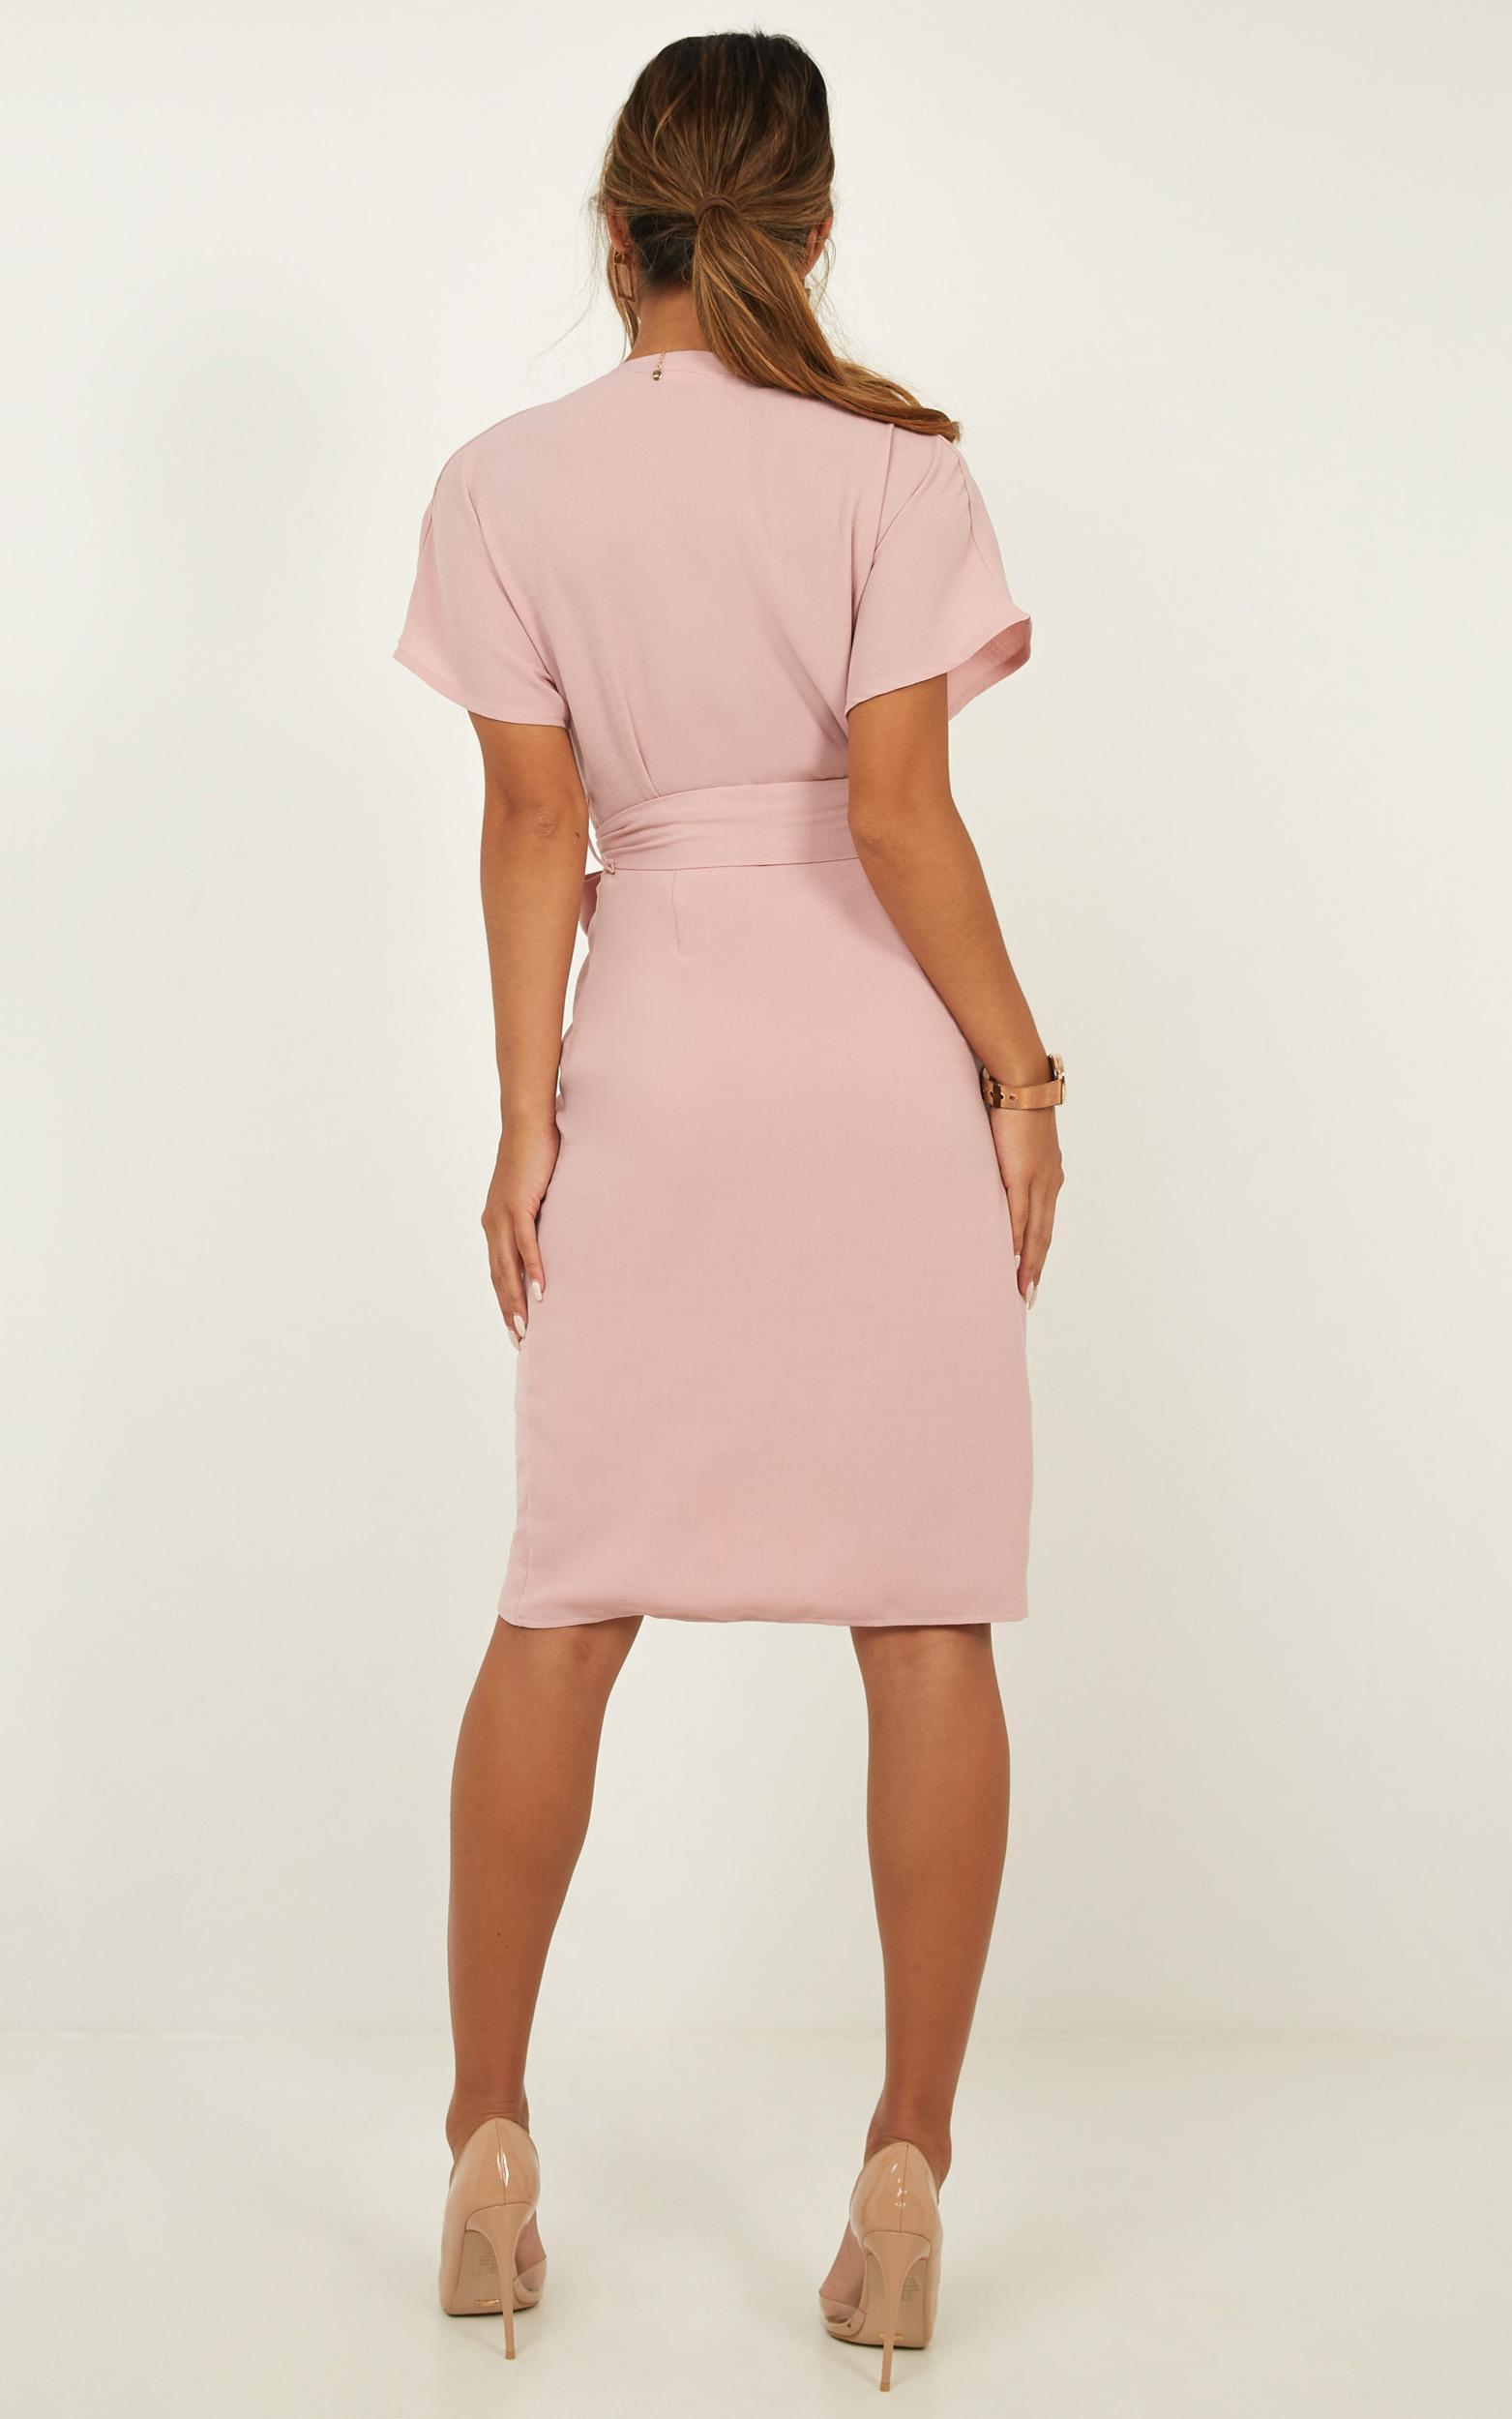 All Shook Up Dress in blush linen look - 12 (L), Blush, hi-res image number null